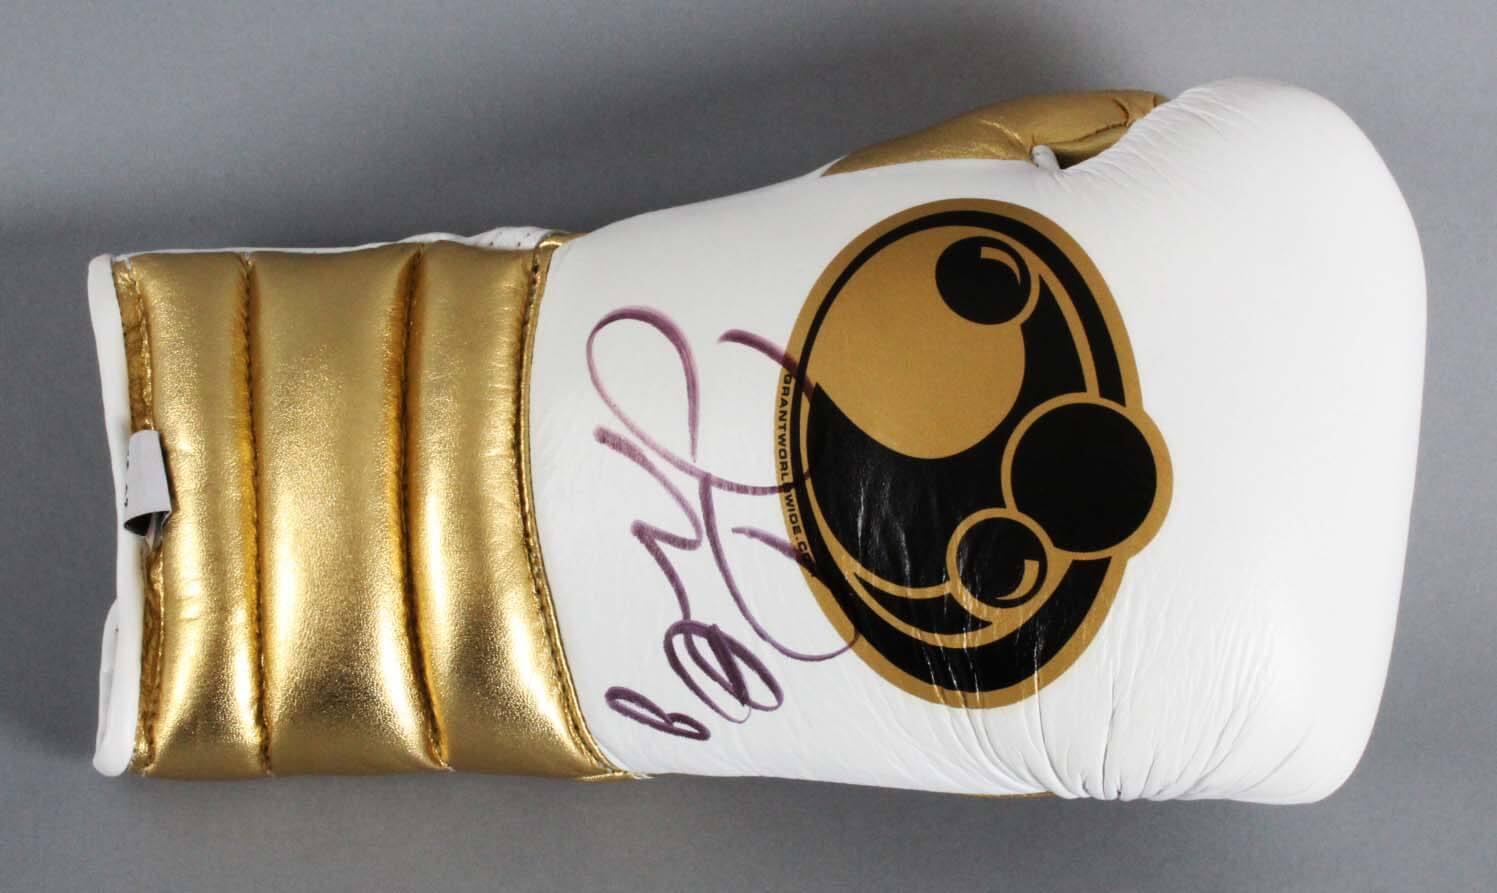 Floyd Mayweather Jr. Signed Boxing Glove - JSA Full LOA